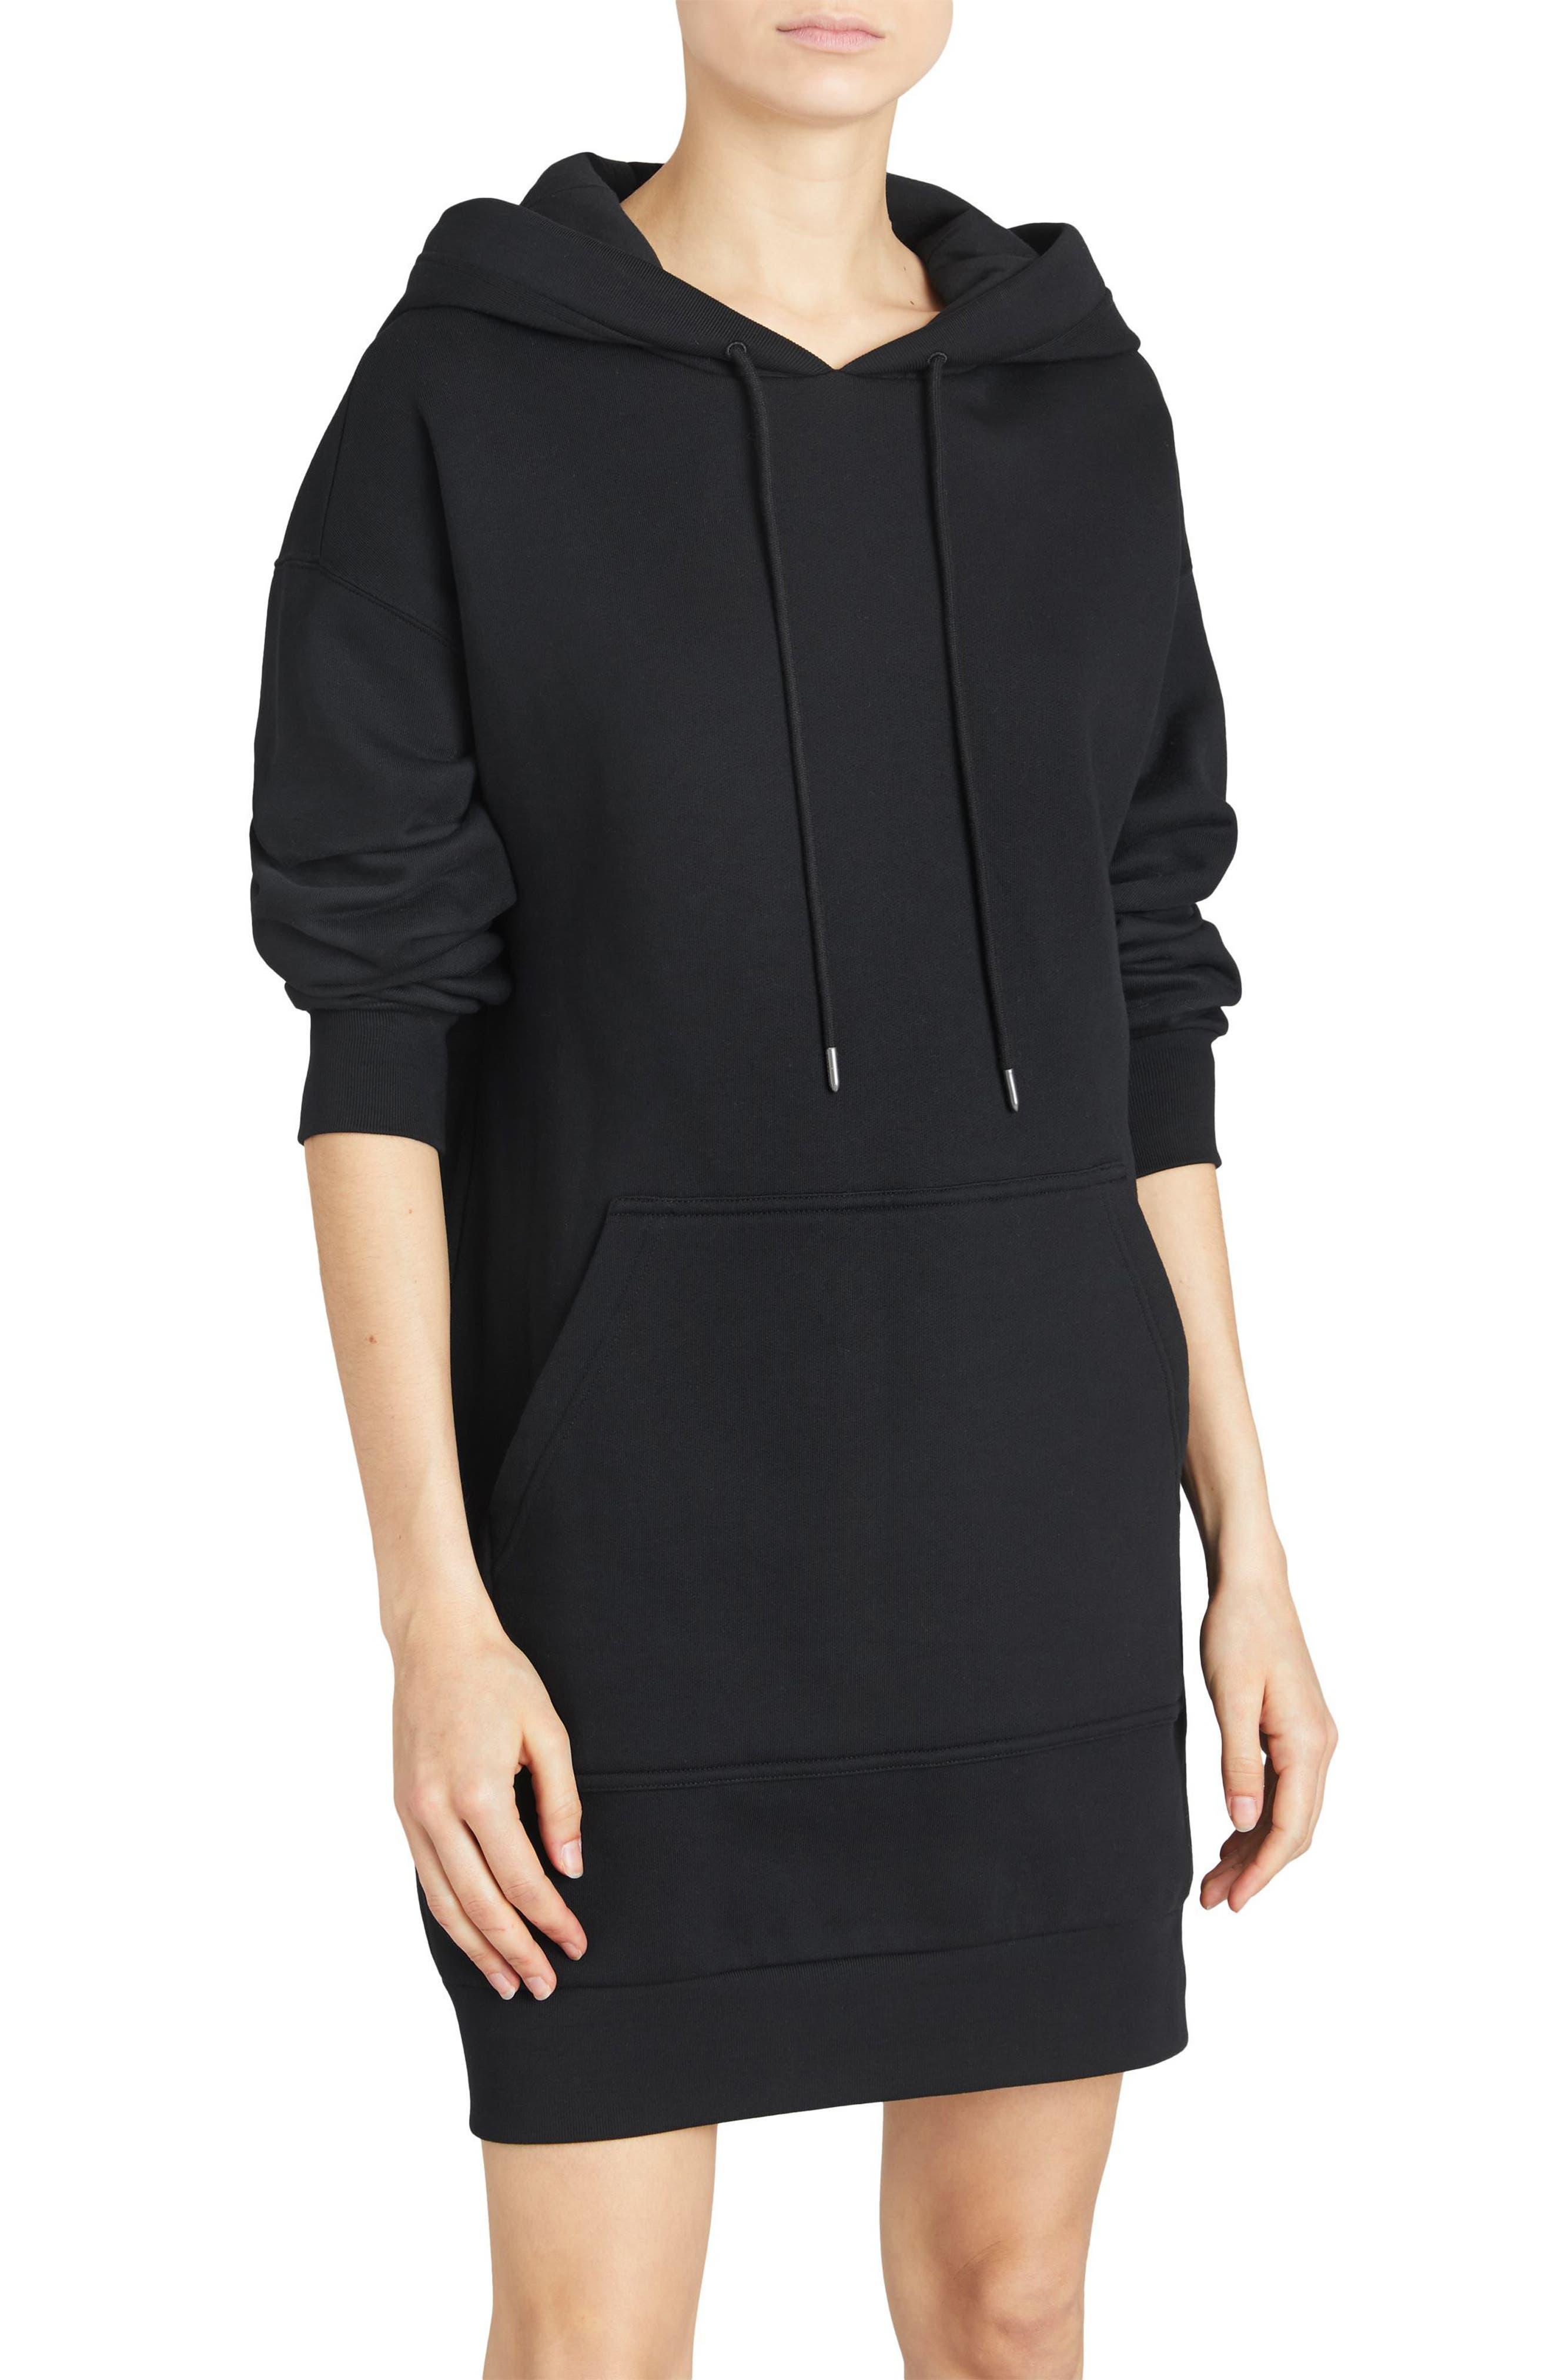 Cardeiver Jersey Sweatshirt Dress,                             Main thumbnail 1, color,                             001